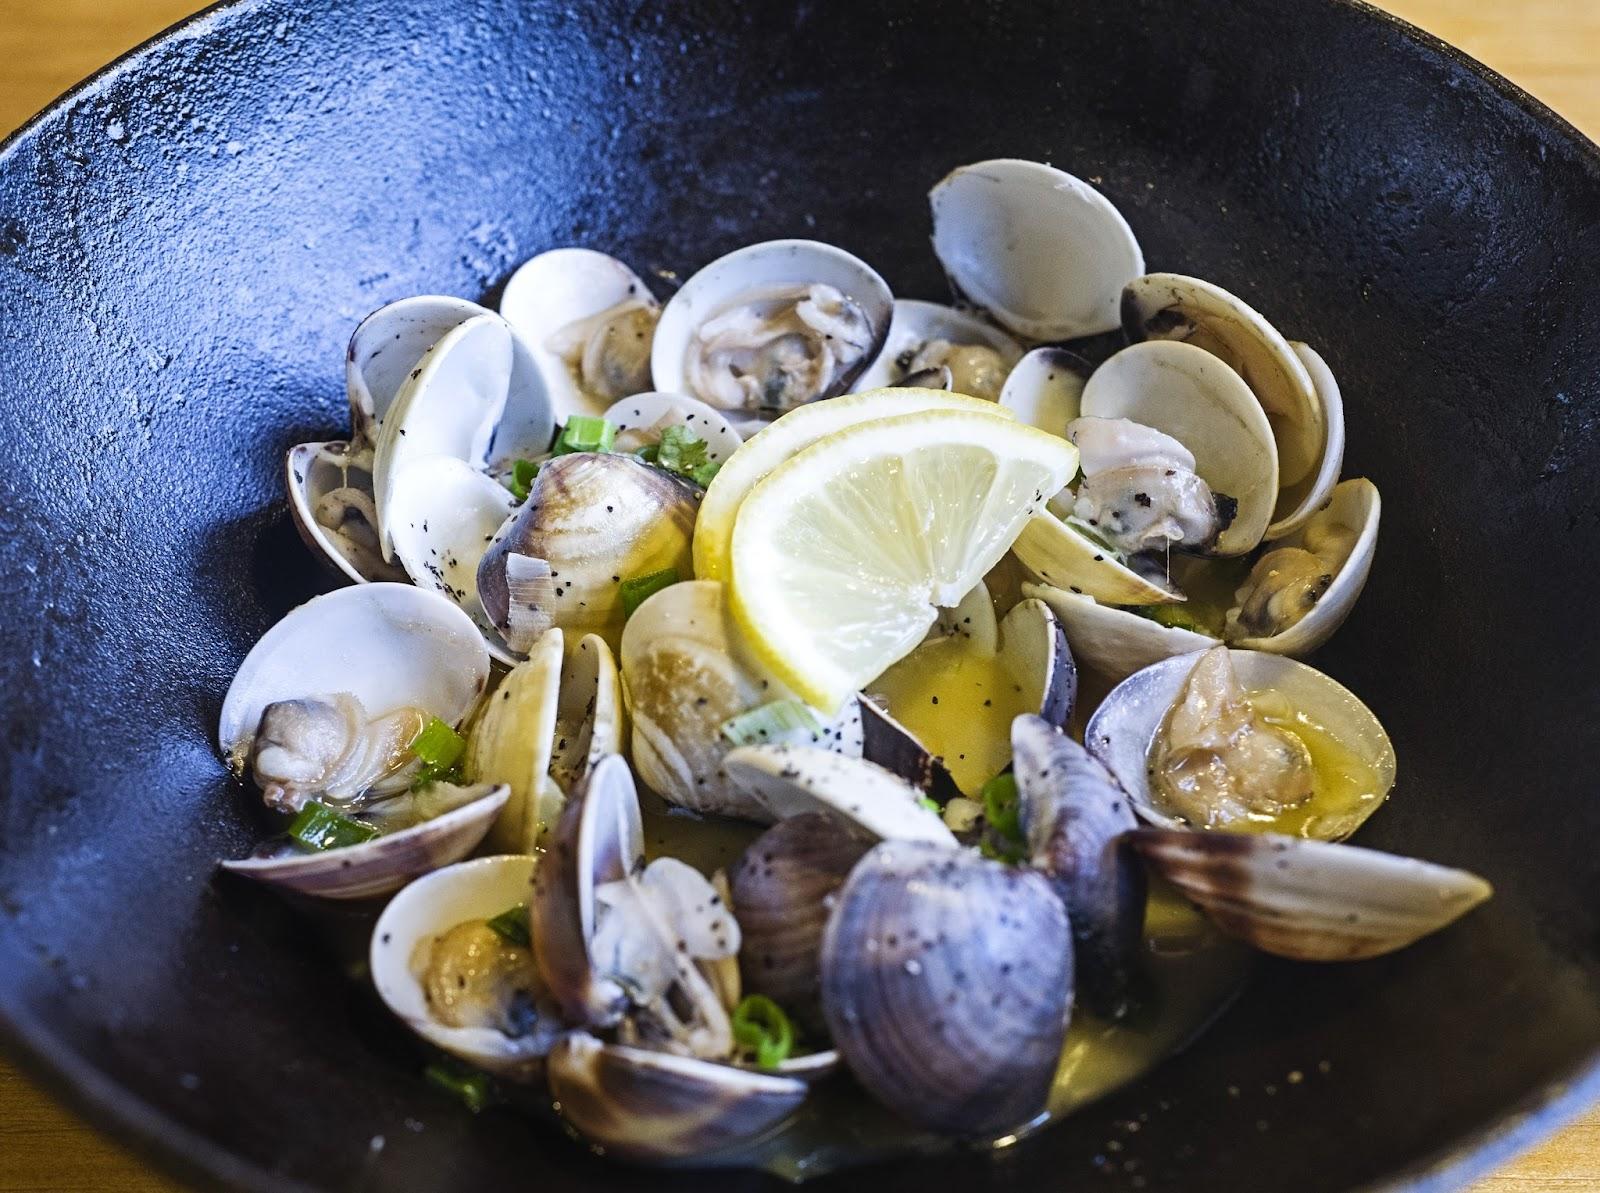 f-clams-L1080781.jpg